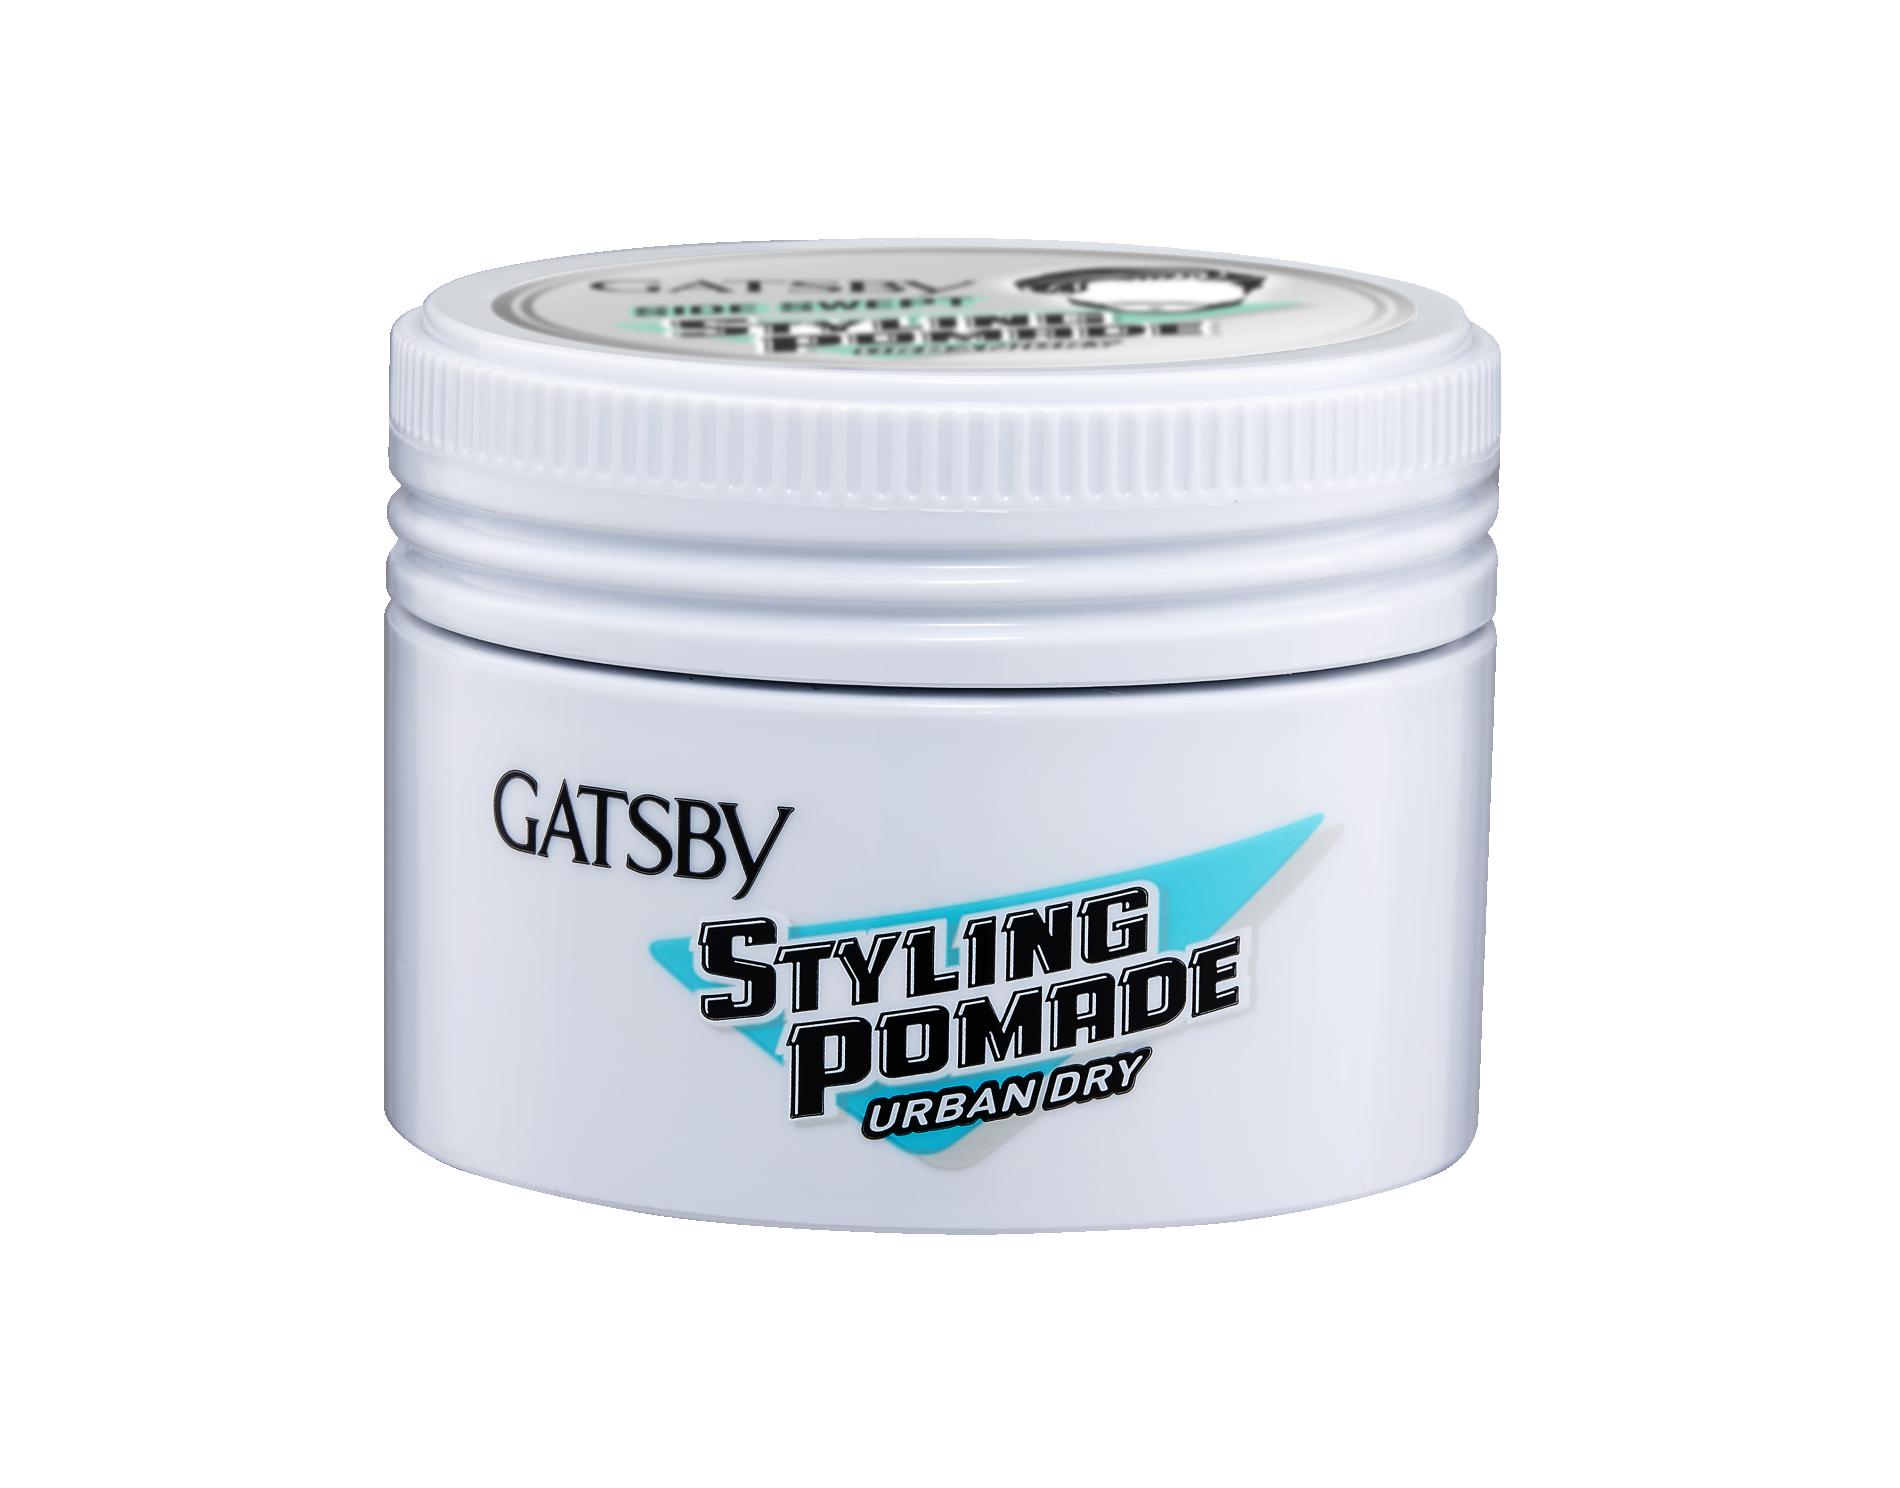 GATSBY Styling Pomade Urban Dry